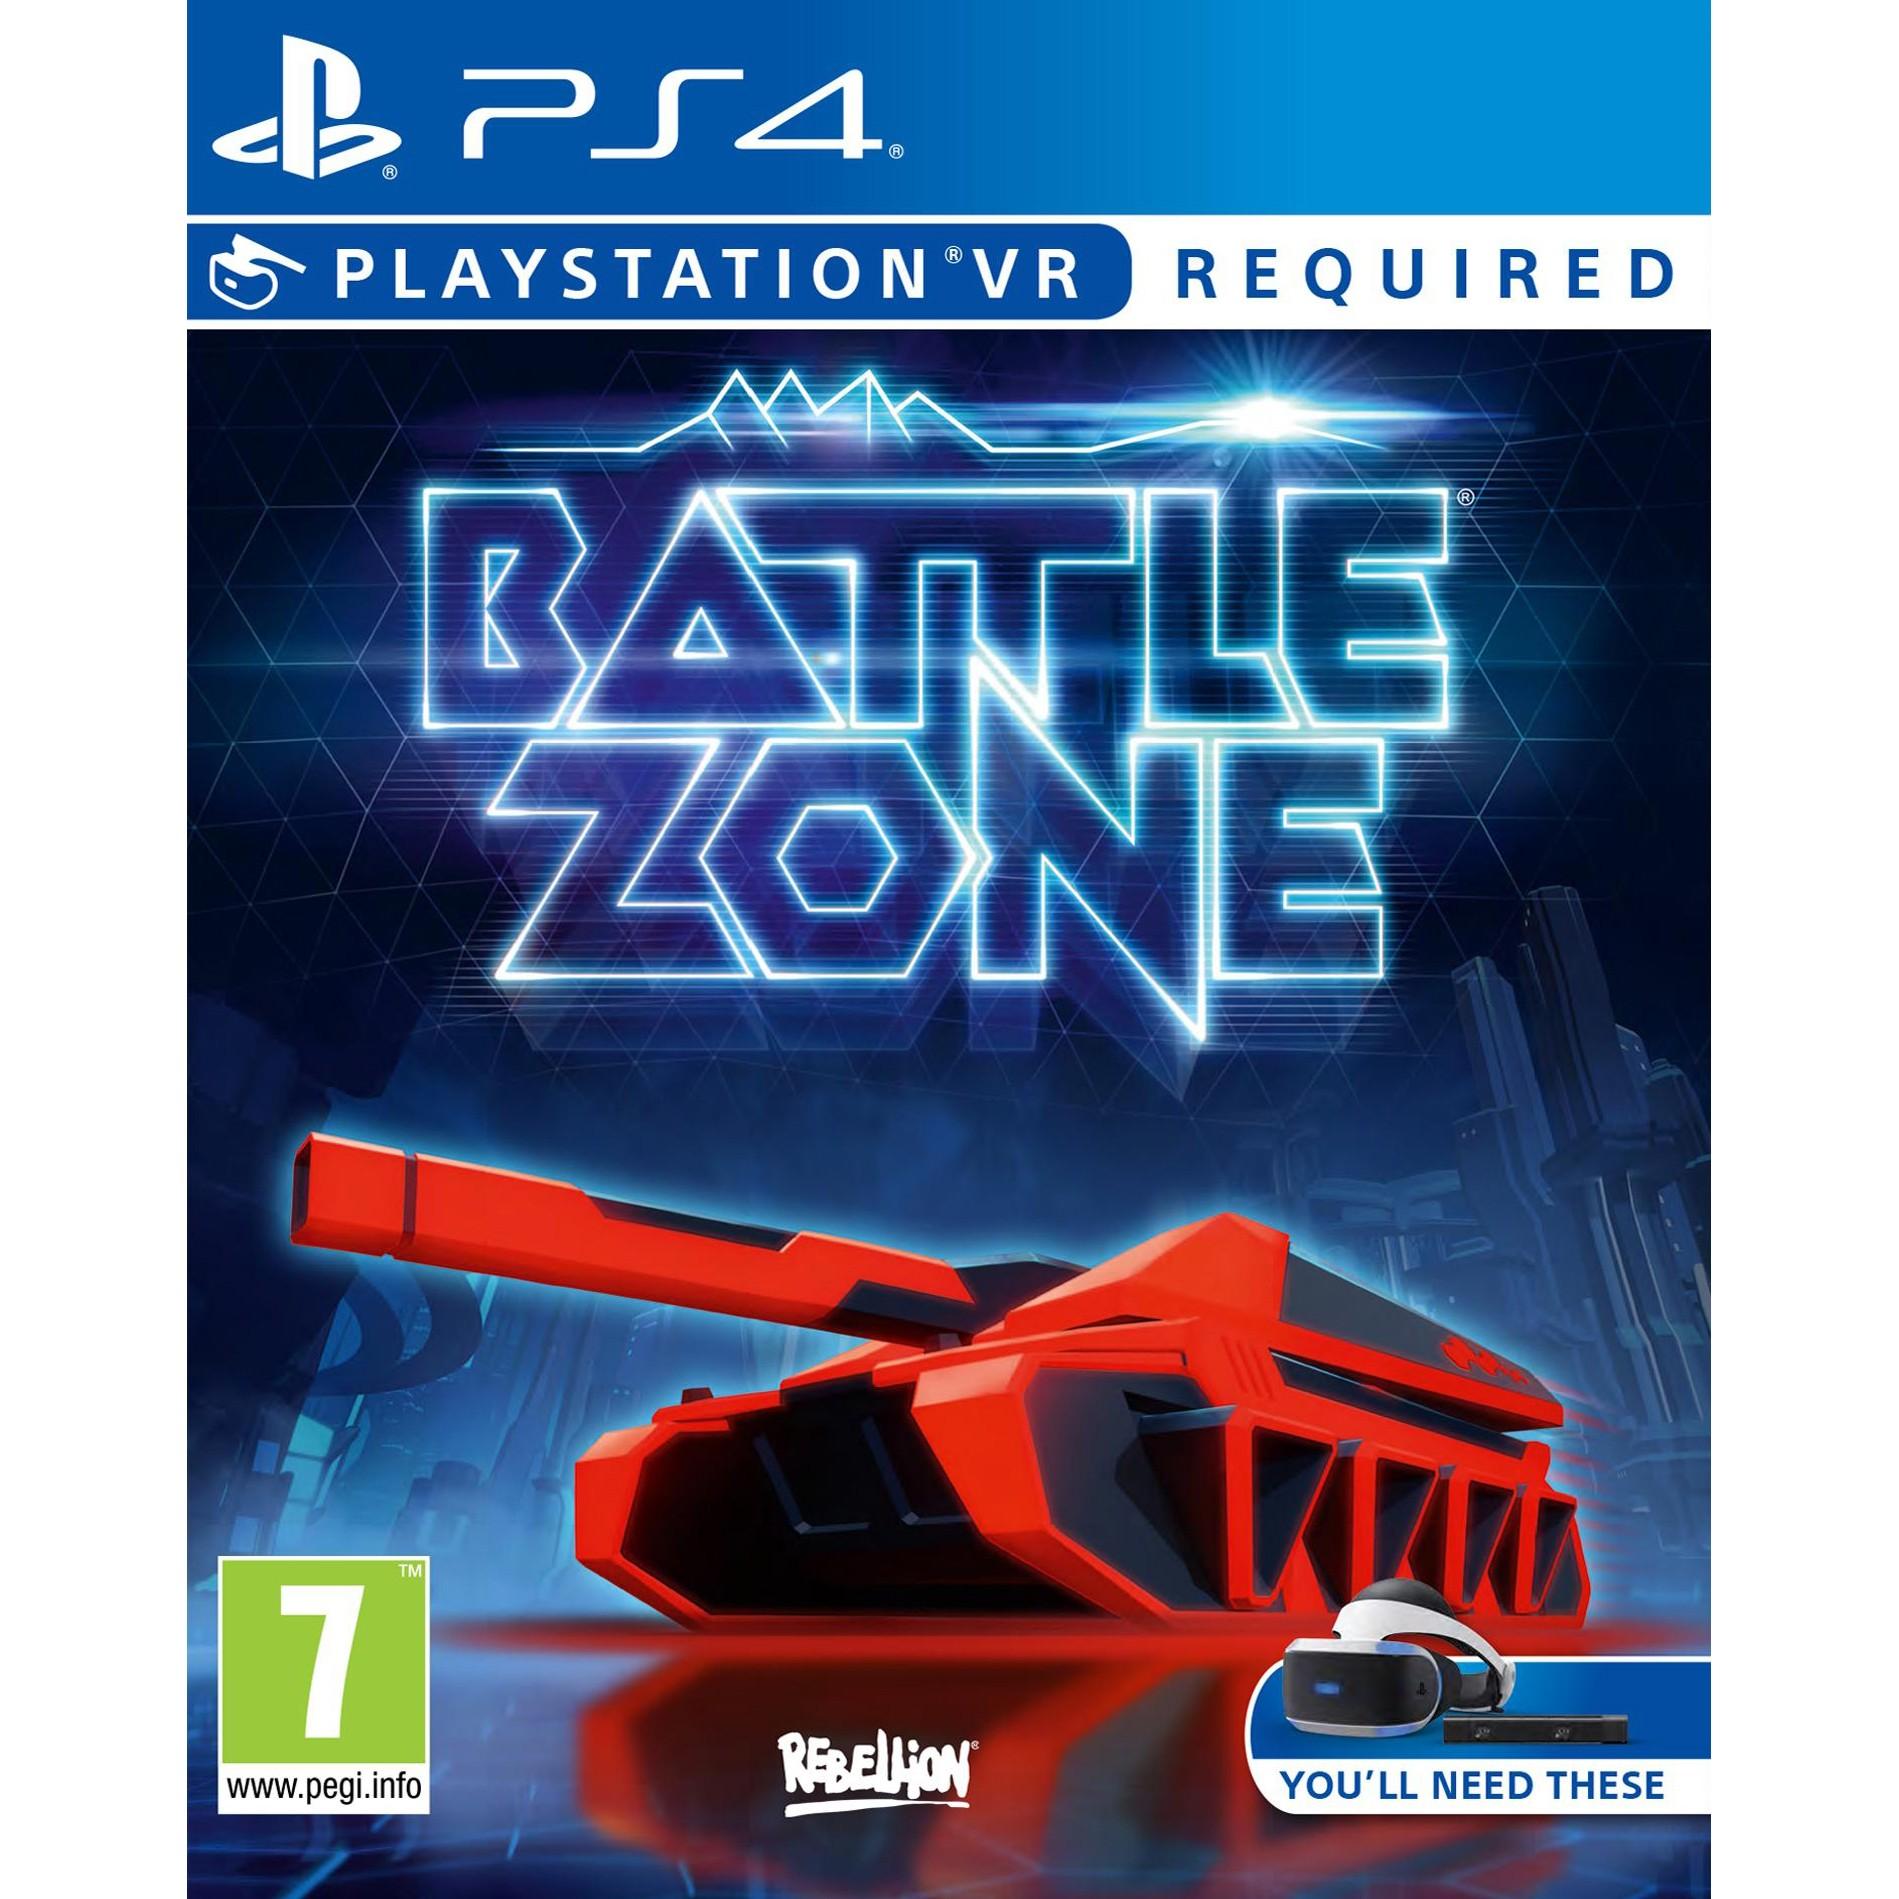 1006255 : Battlezone VR (PS4)